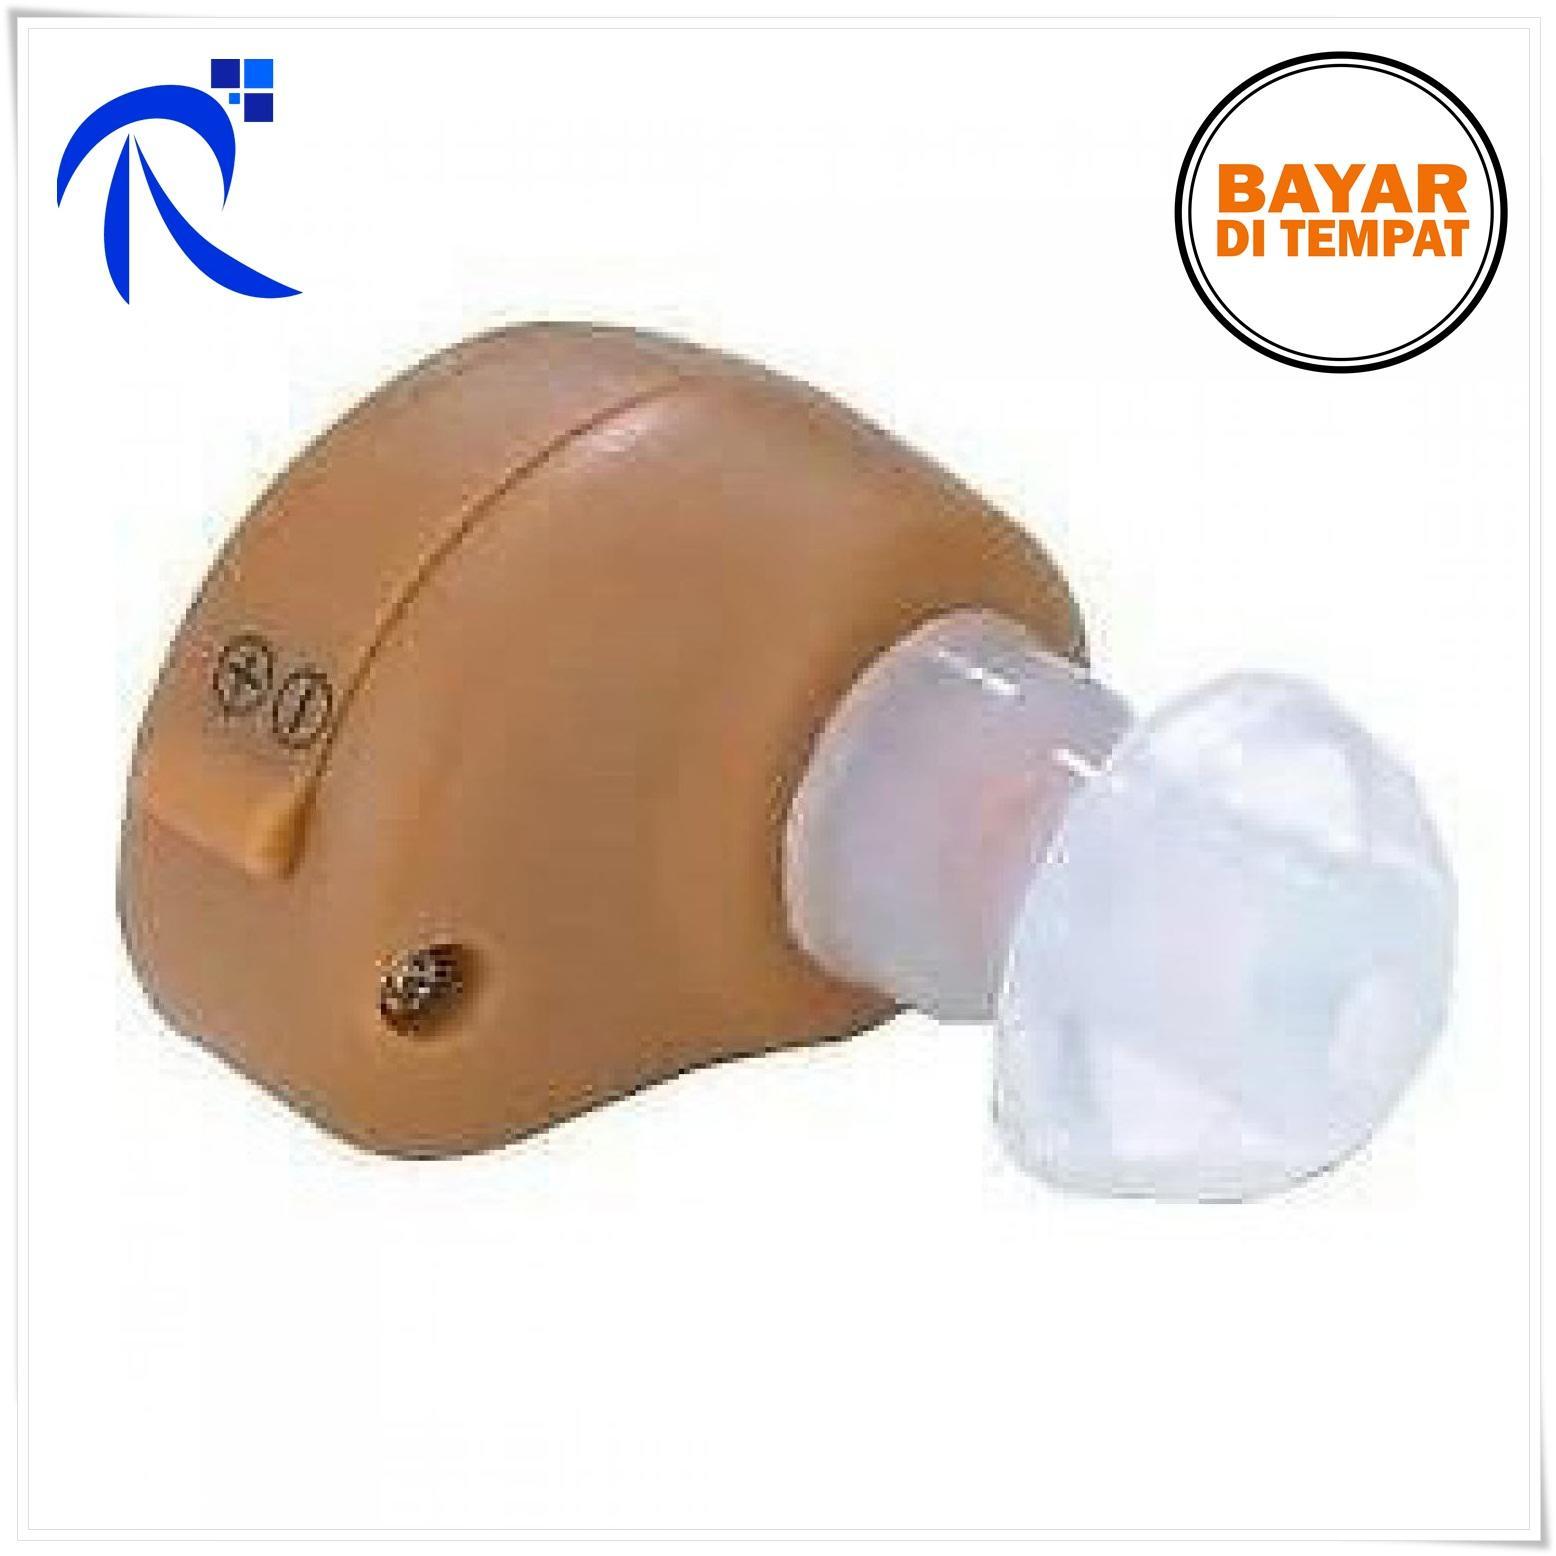 Axon V168 Alat Bantu Dengar Mini Kecil Hearing Aid Telinga Tuli Tipe Source Rimas Earbud K80